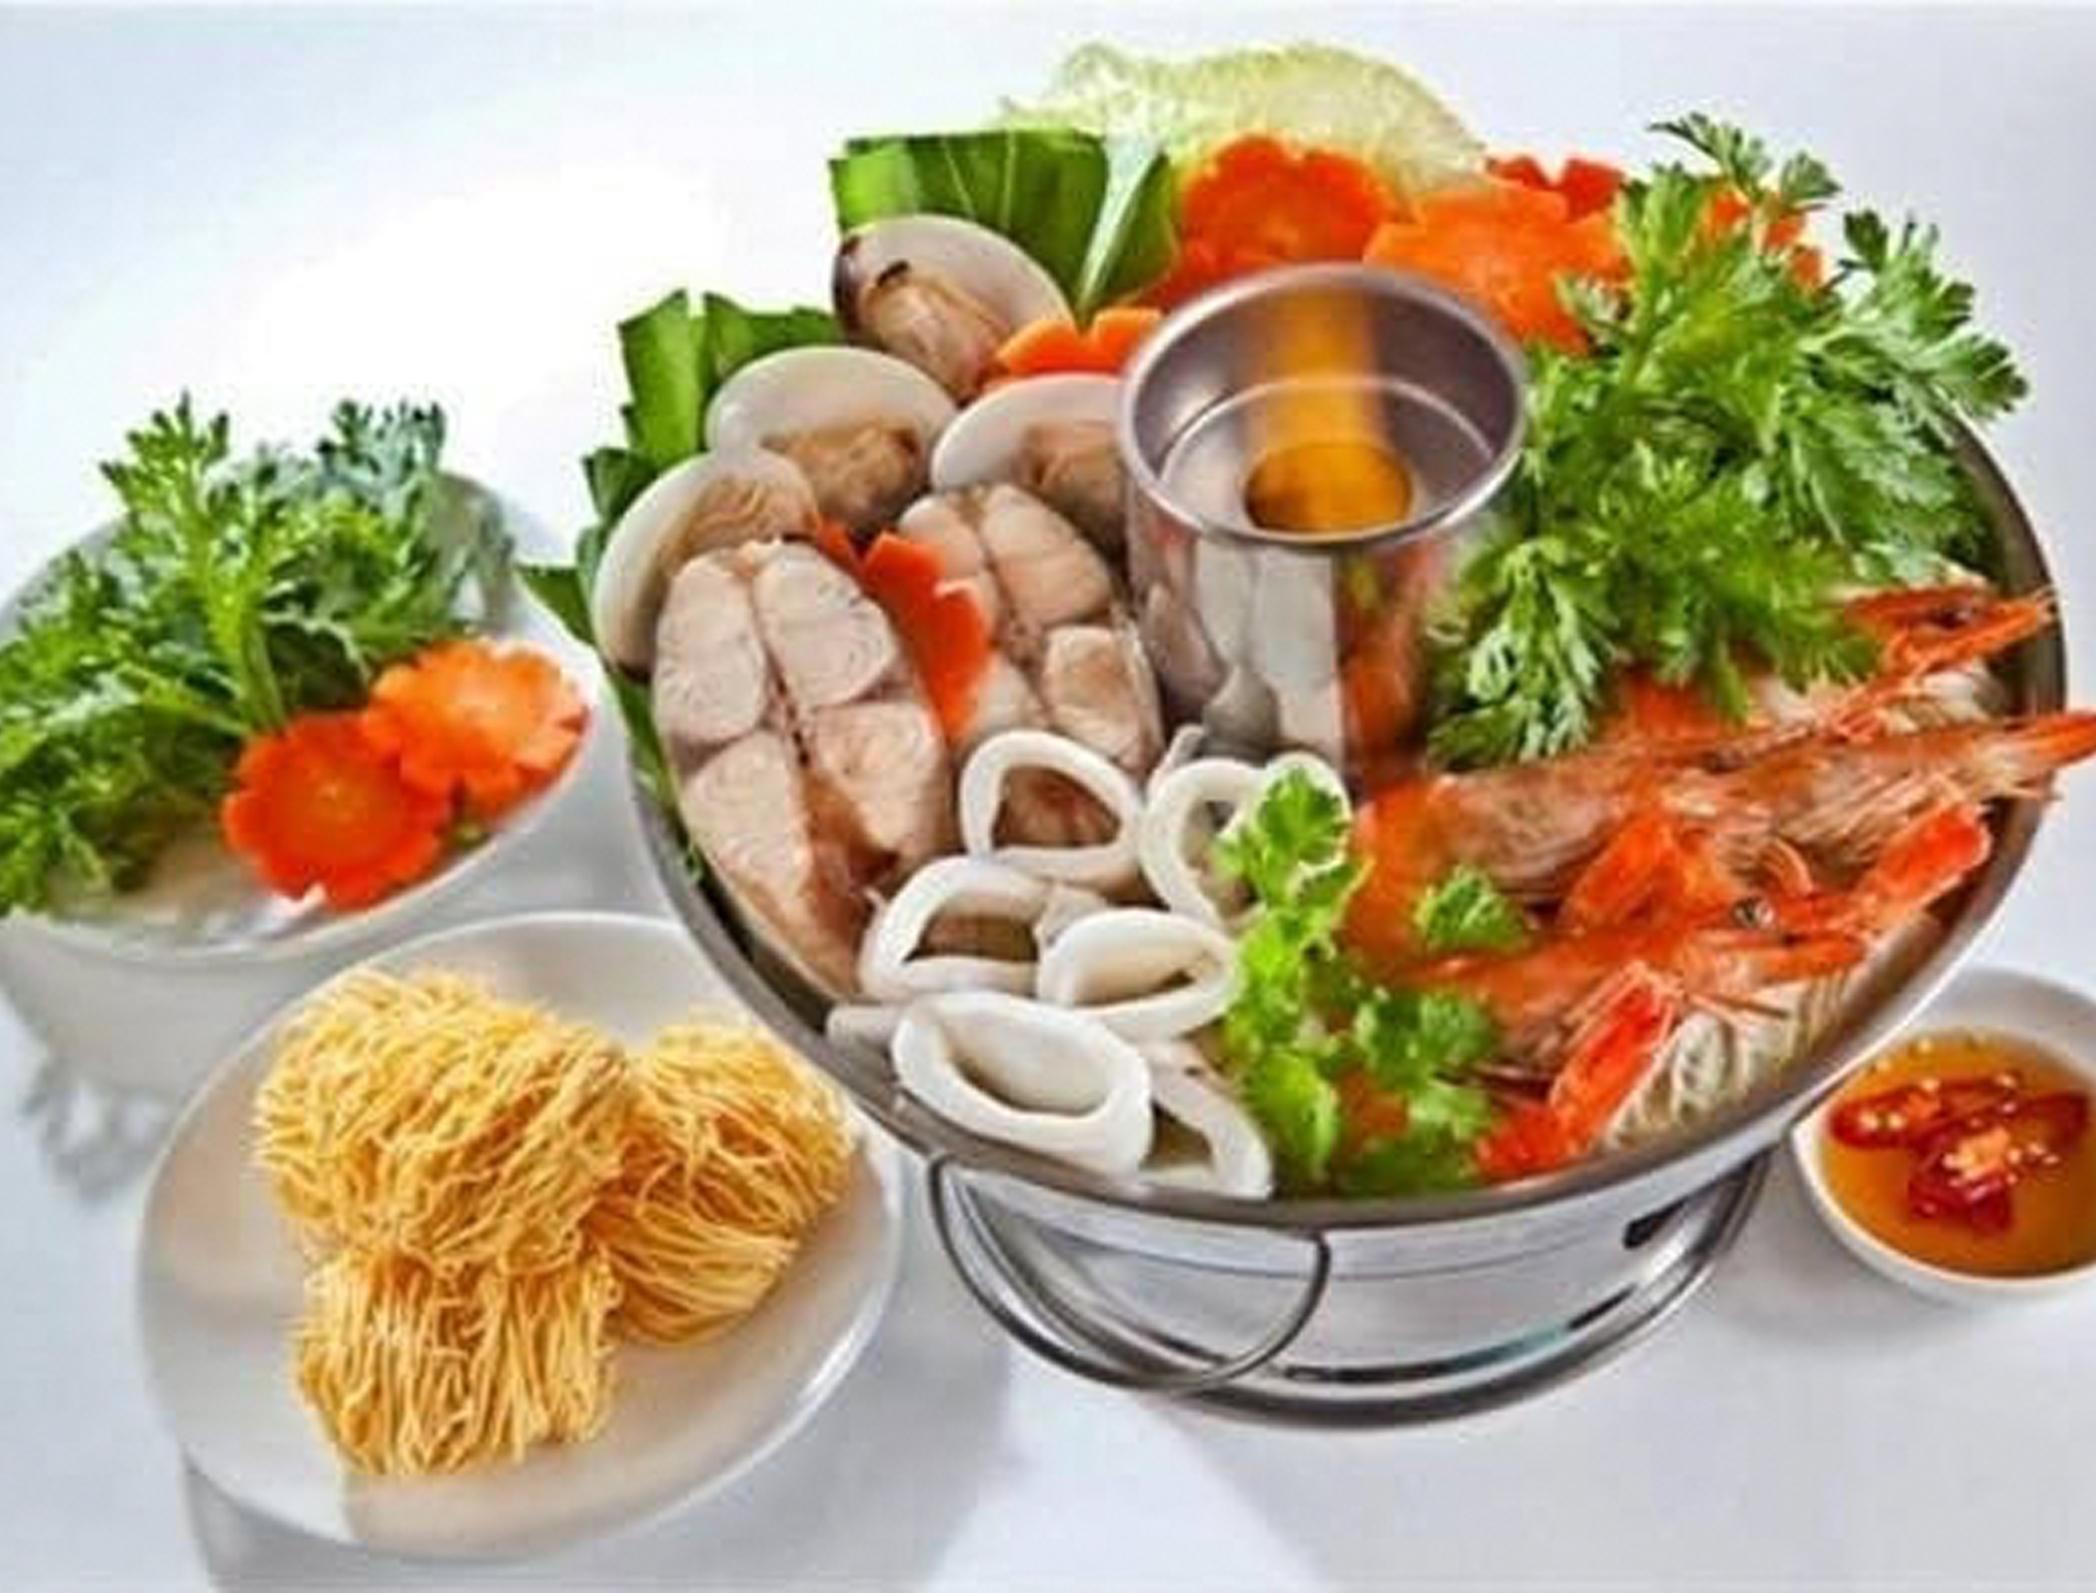 Seafood Hot Pot - Small - $14.99Large - $34.99